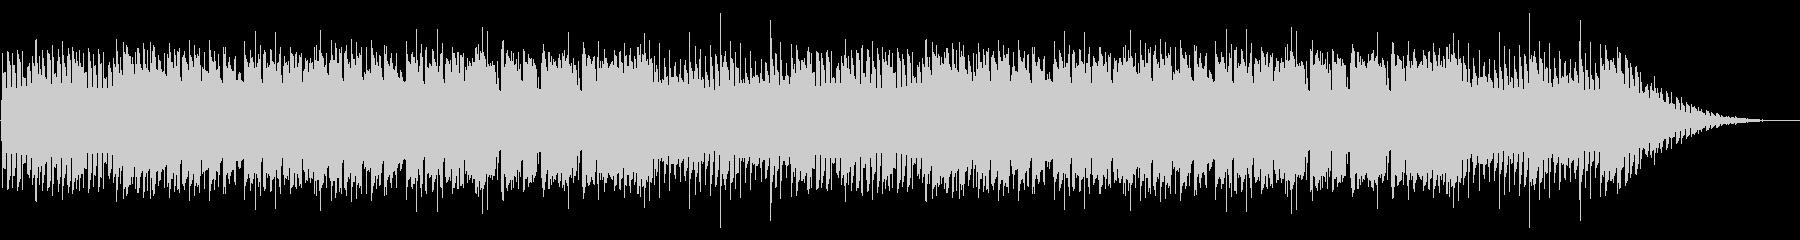 NES アクションC06-1(ステージ4の未再生の波形